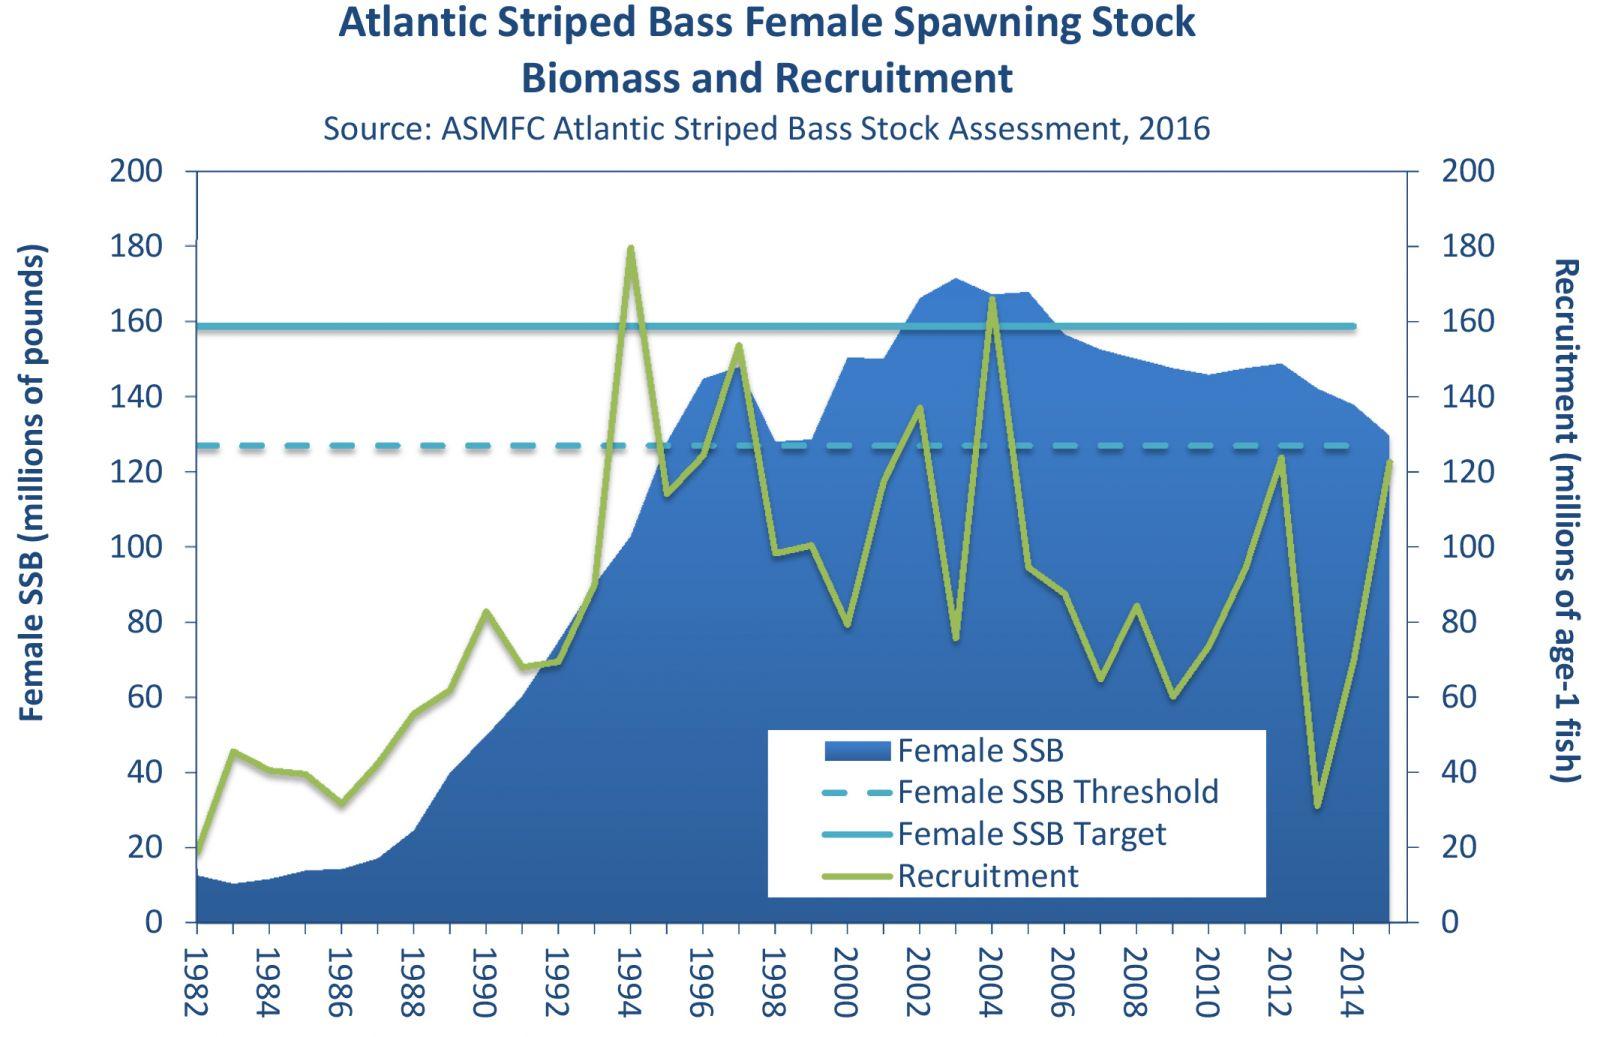 Atlantic Striped Bass